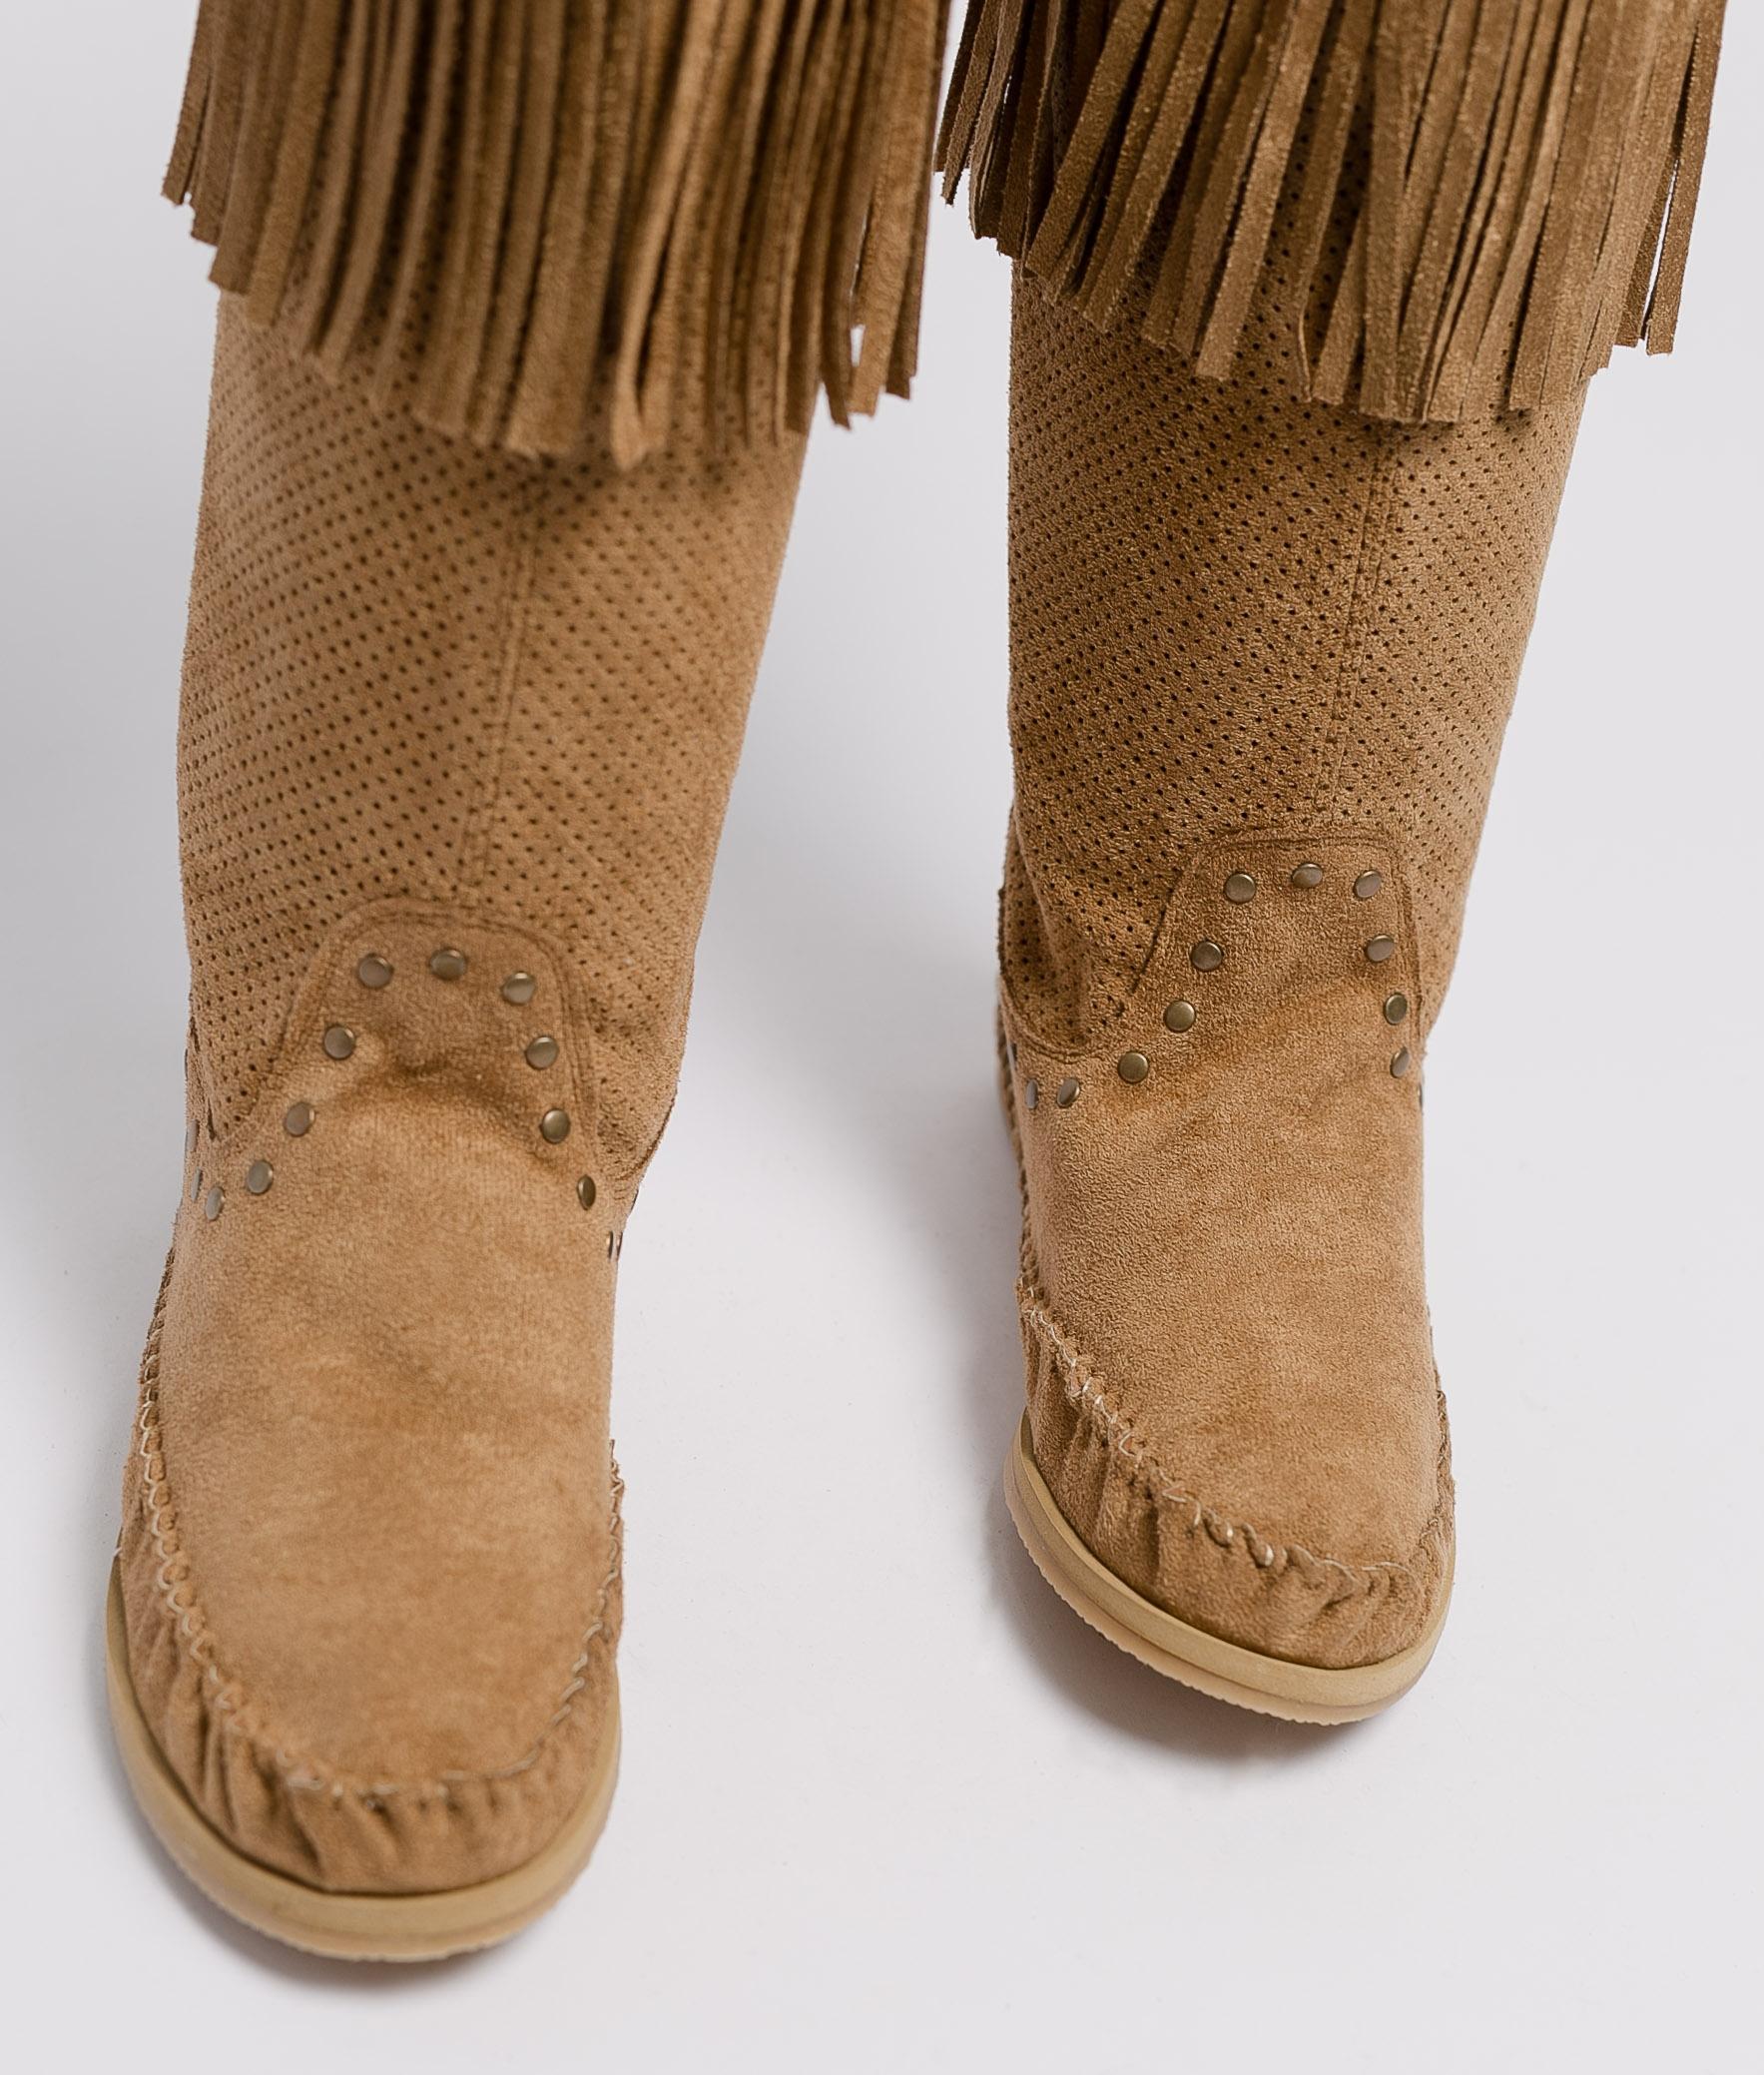 Stivali Indianini Sarale - Cammello